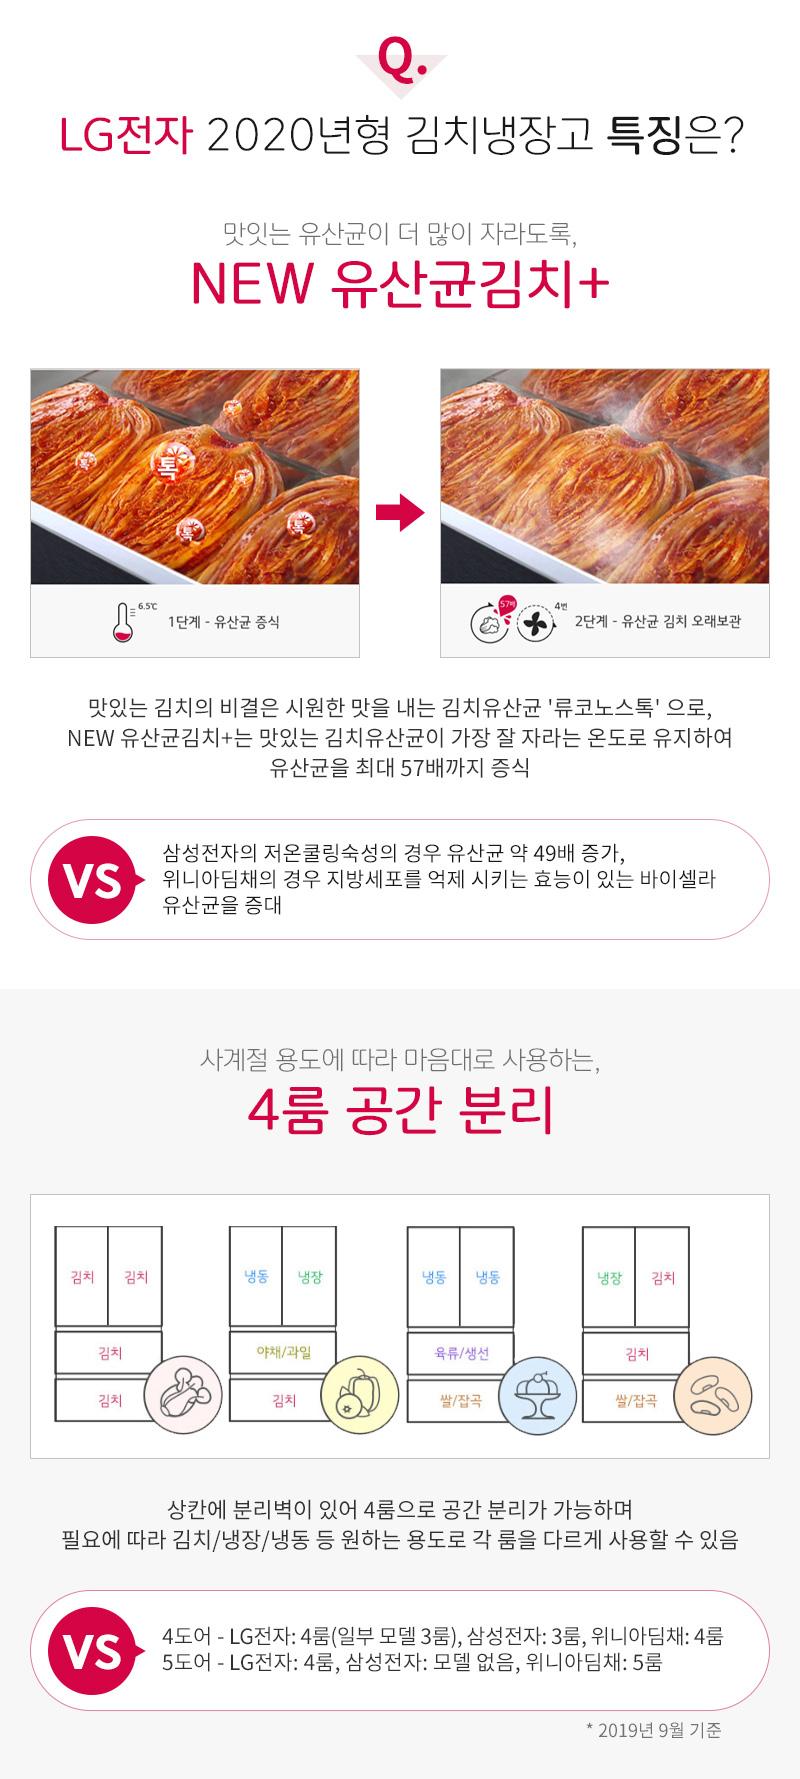 LG전자 2020년형 김치냉장고 특징